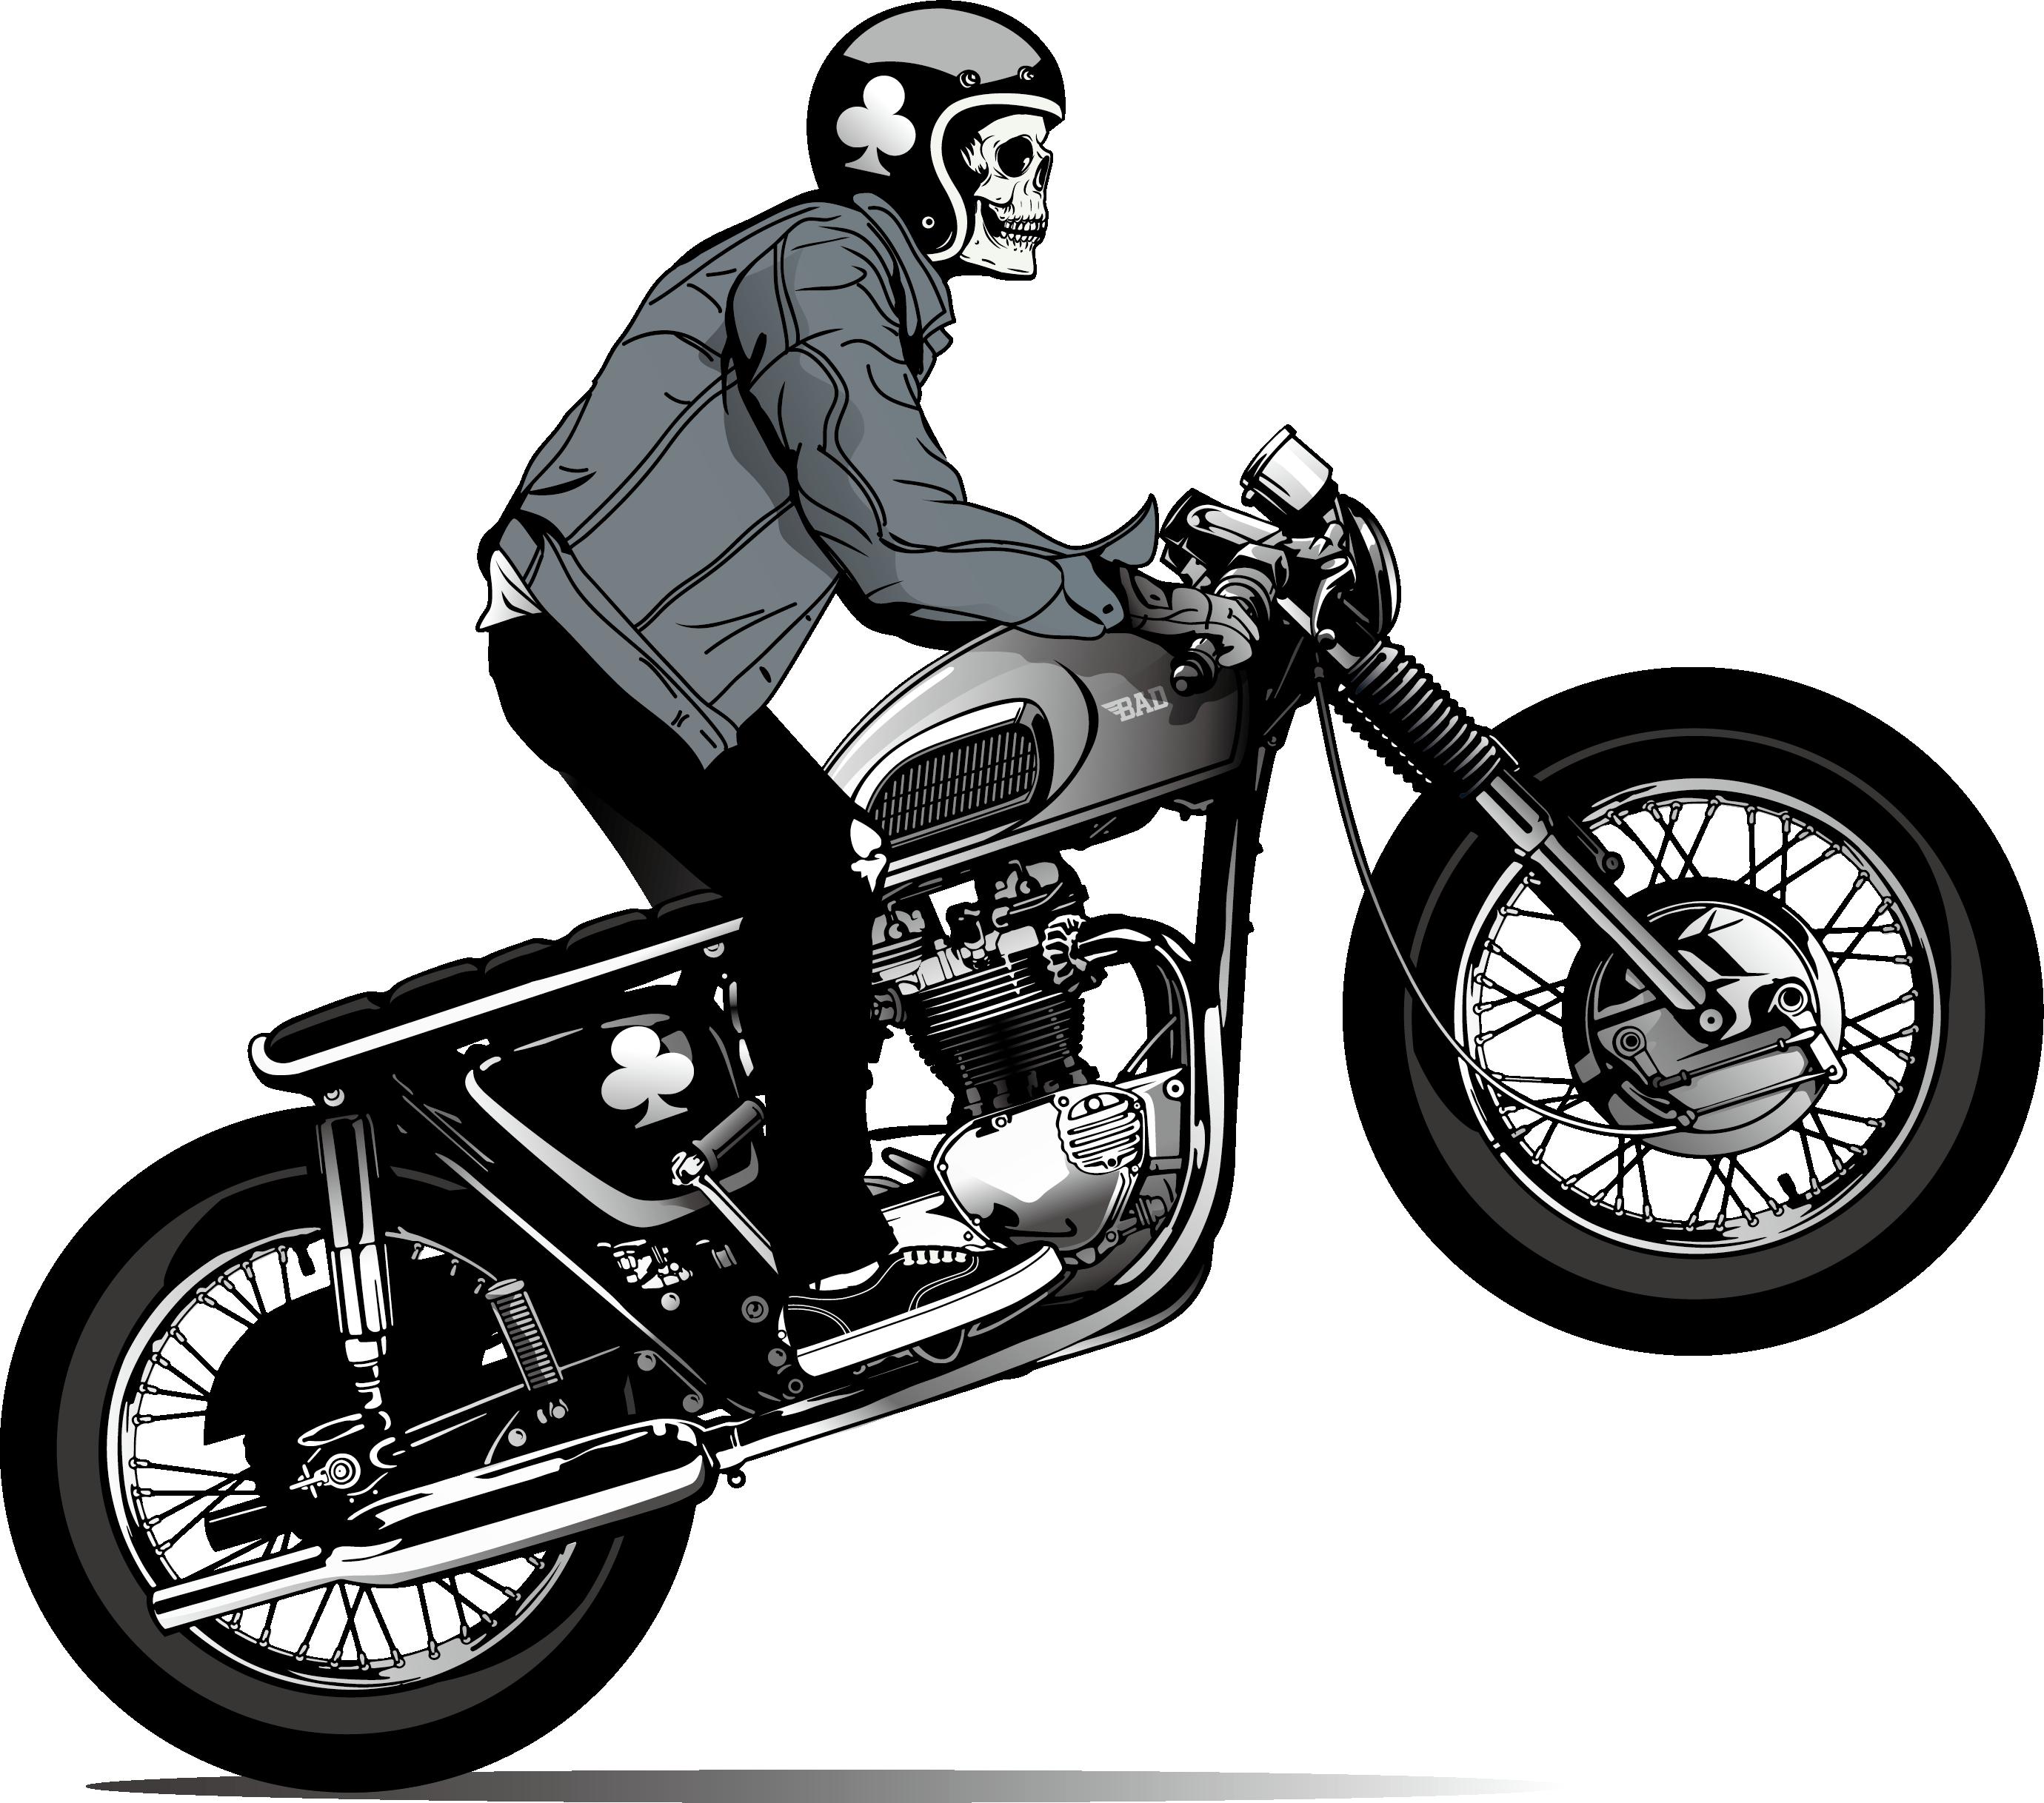 Helmet skull png download. Motorcycle clipart cool motorcycle